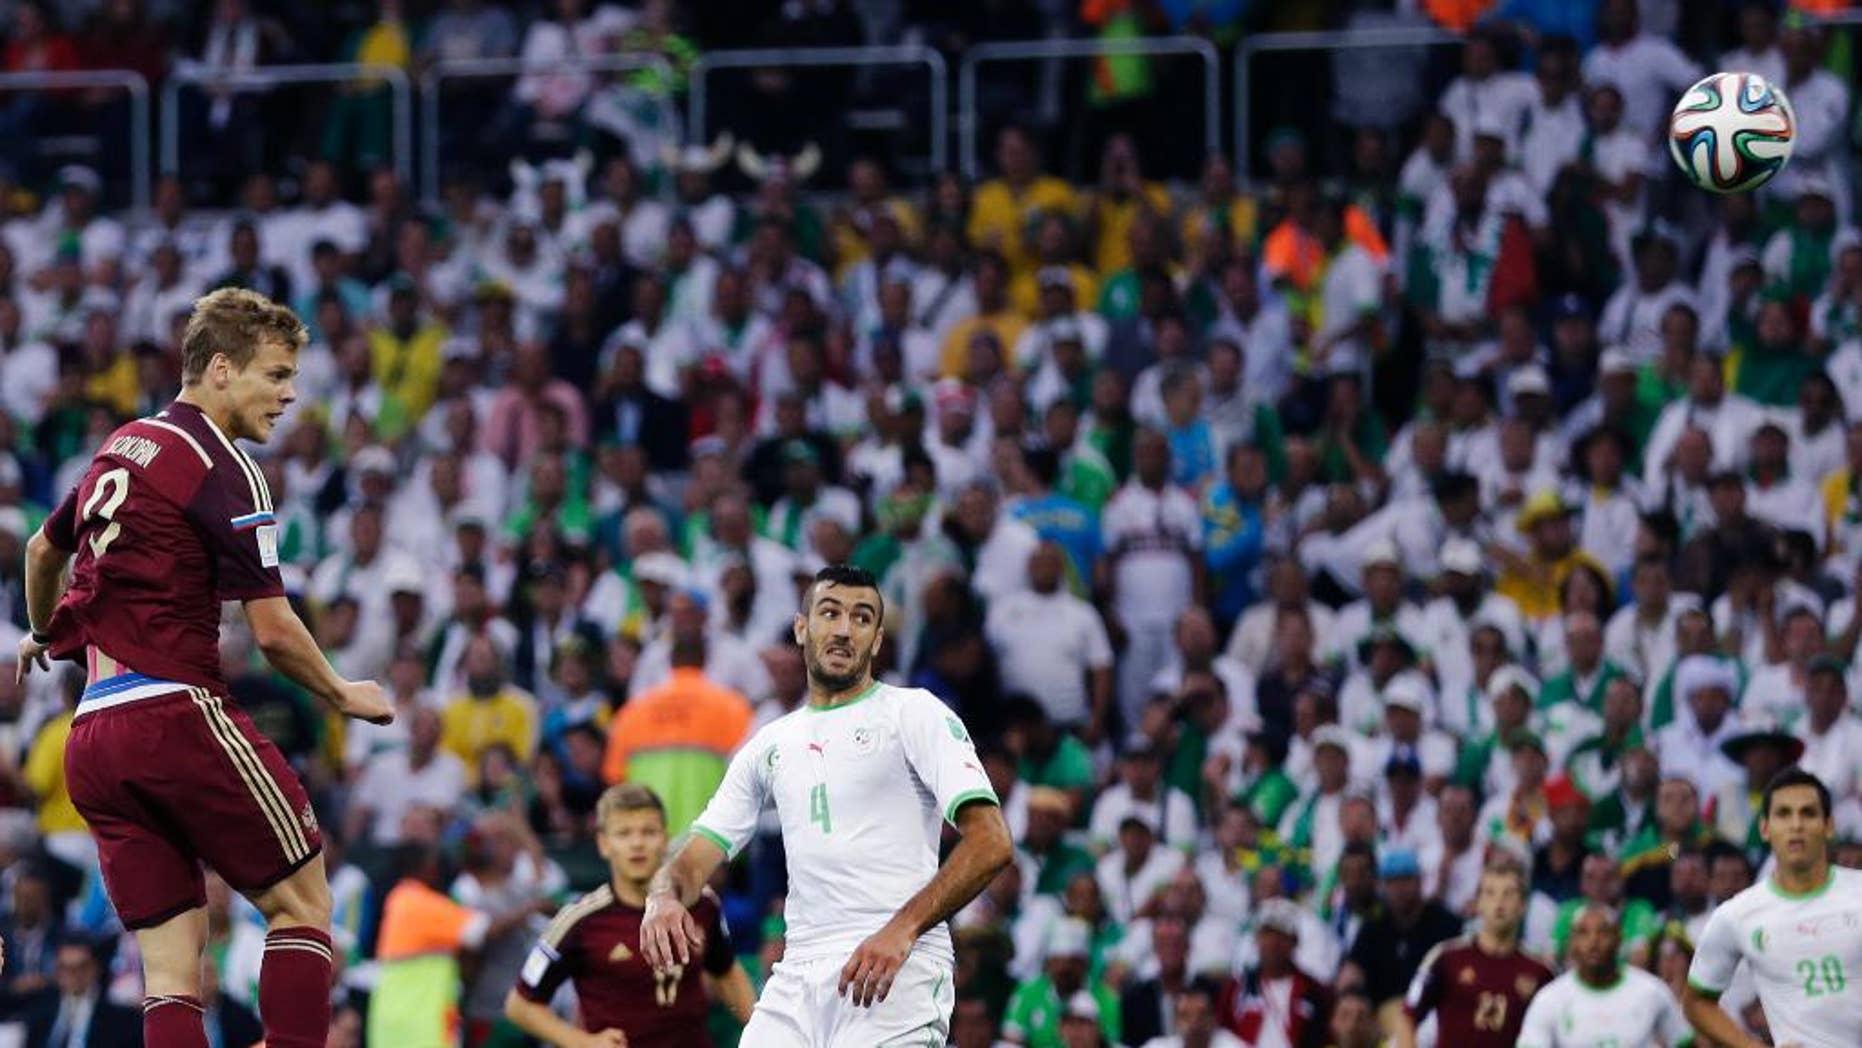 Russia's Alexander Kokorin heads the ball to score during the group H World Cup soccer match between Algeria and Russia at the Arena da Baixada in Curitiba, Brazil, Thursday, June 26, 2014. (AP Photo/Fernando Vergara)